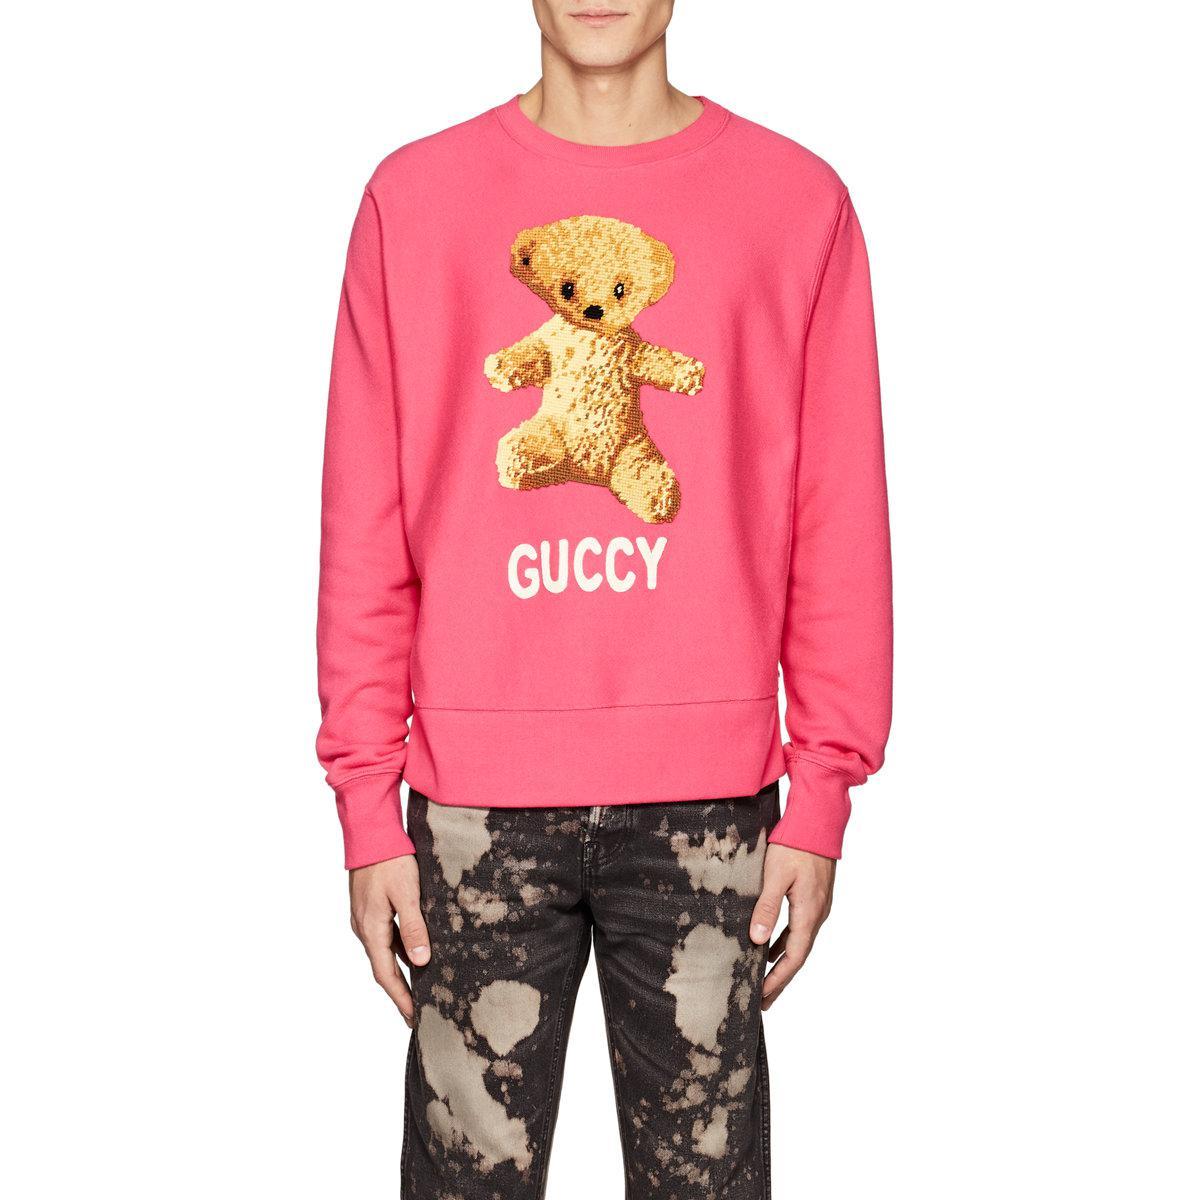 14187327c Gucci Teddy Bear Cotton Sweatshirt in Pink for Men - Lyst